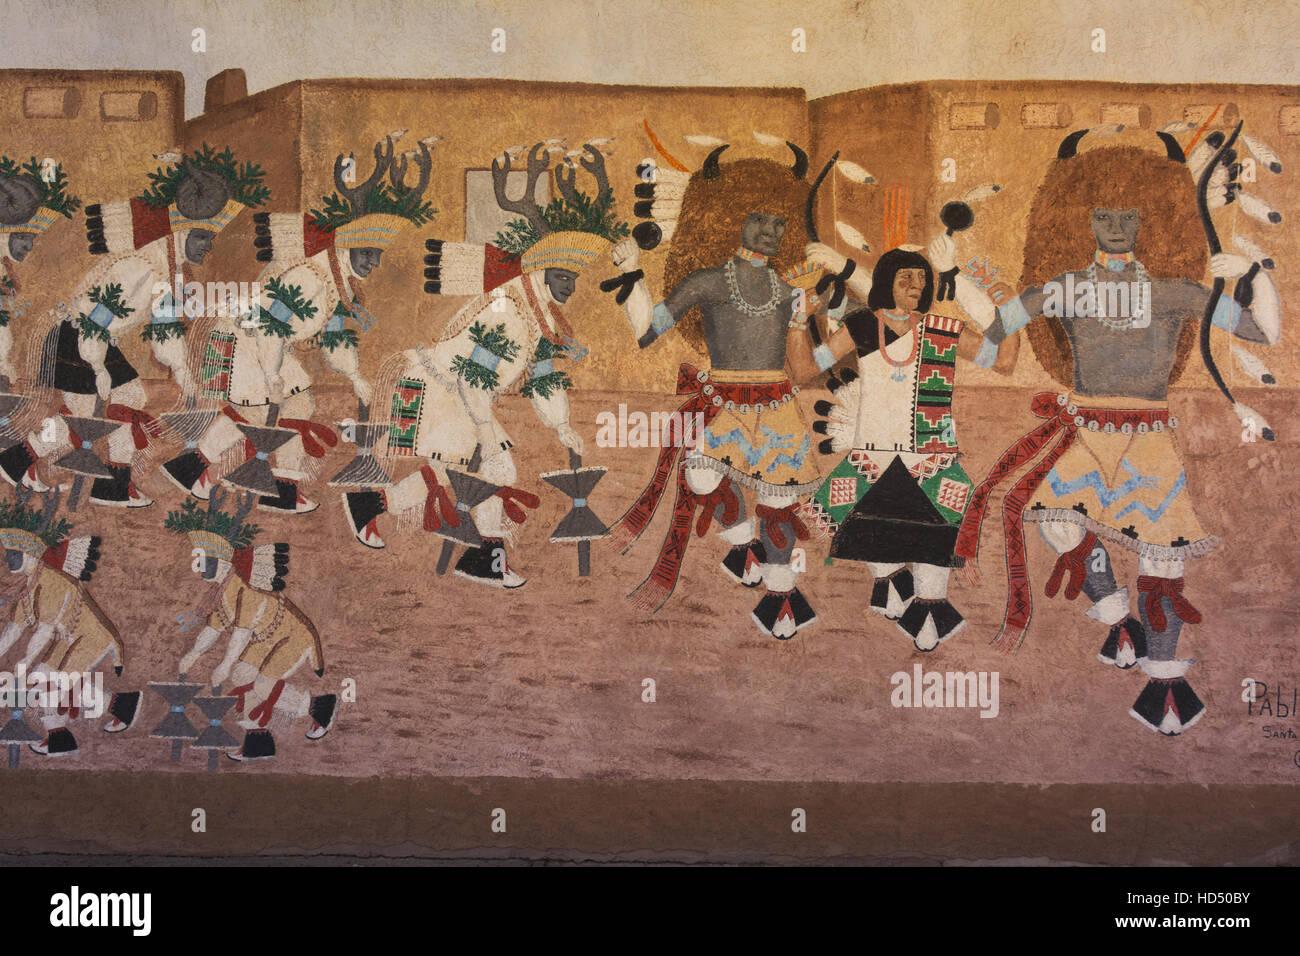 New Mexico, Albuquerque, Indian Pueblo Cultural Center - Stock Image